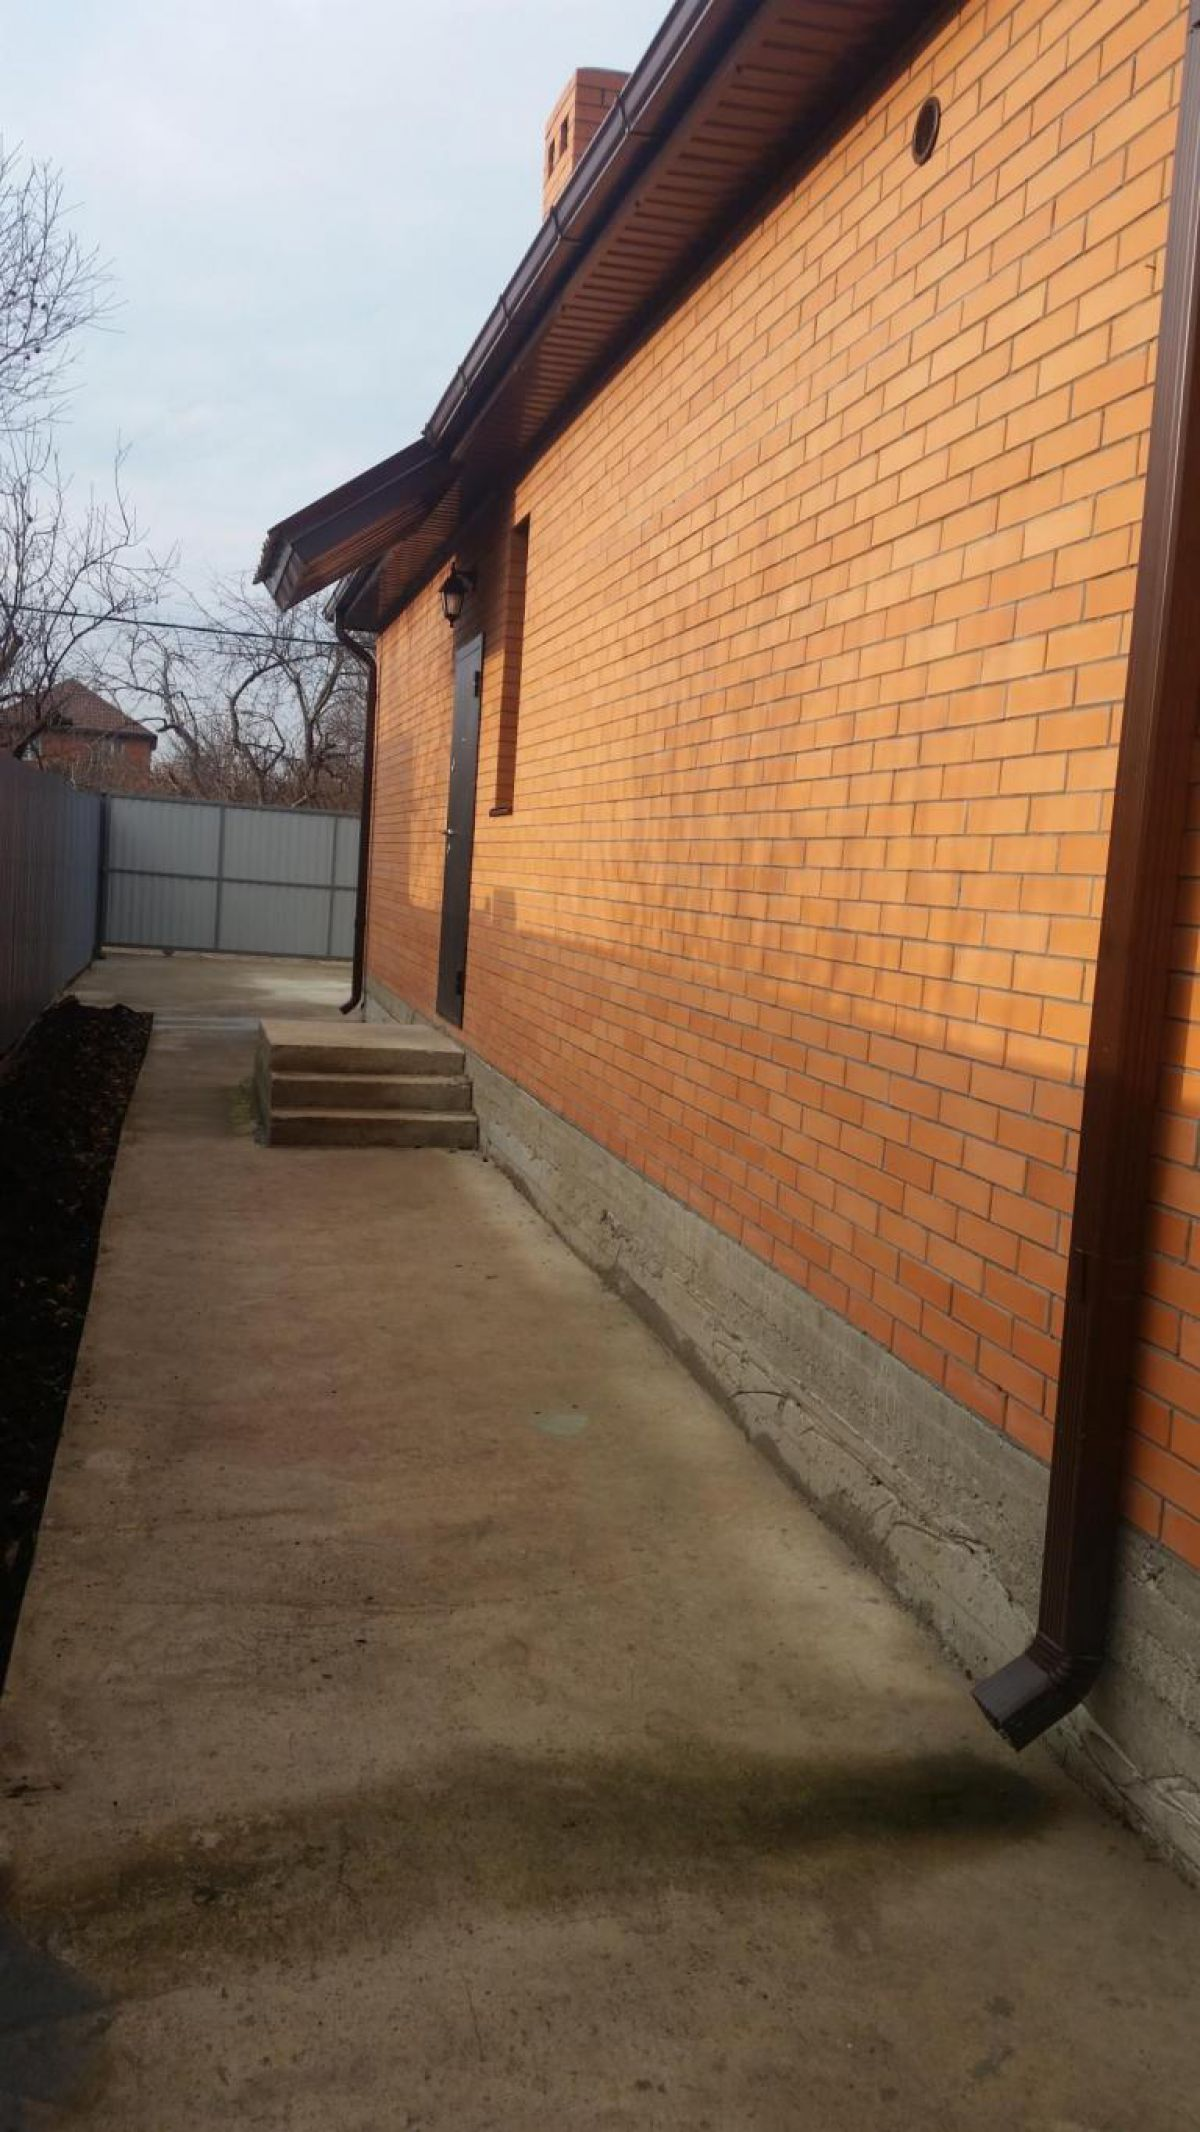 Дача на продажу по адресу Россия, Краснодарский край, Краснодар, Сиреневая ул (Лесник НСТ), 257